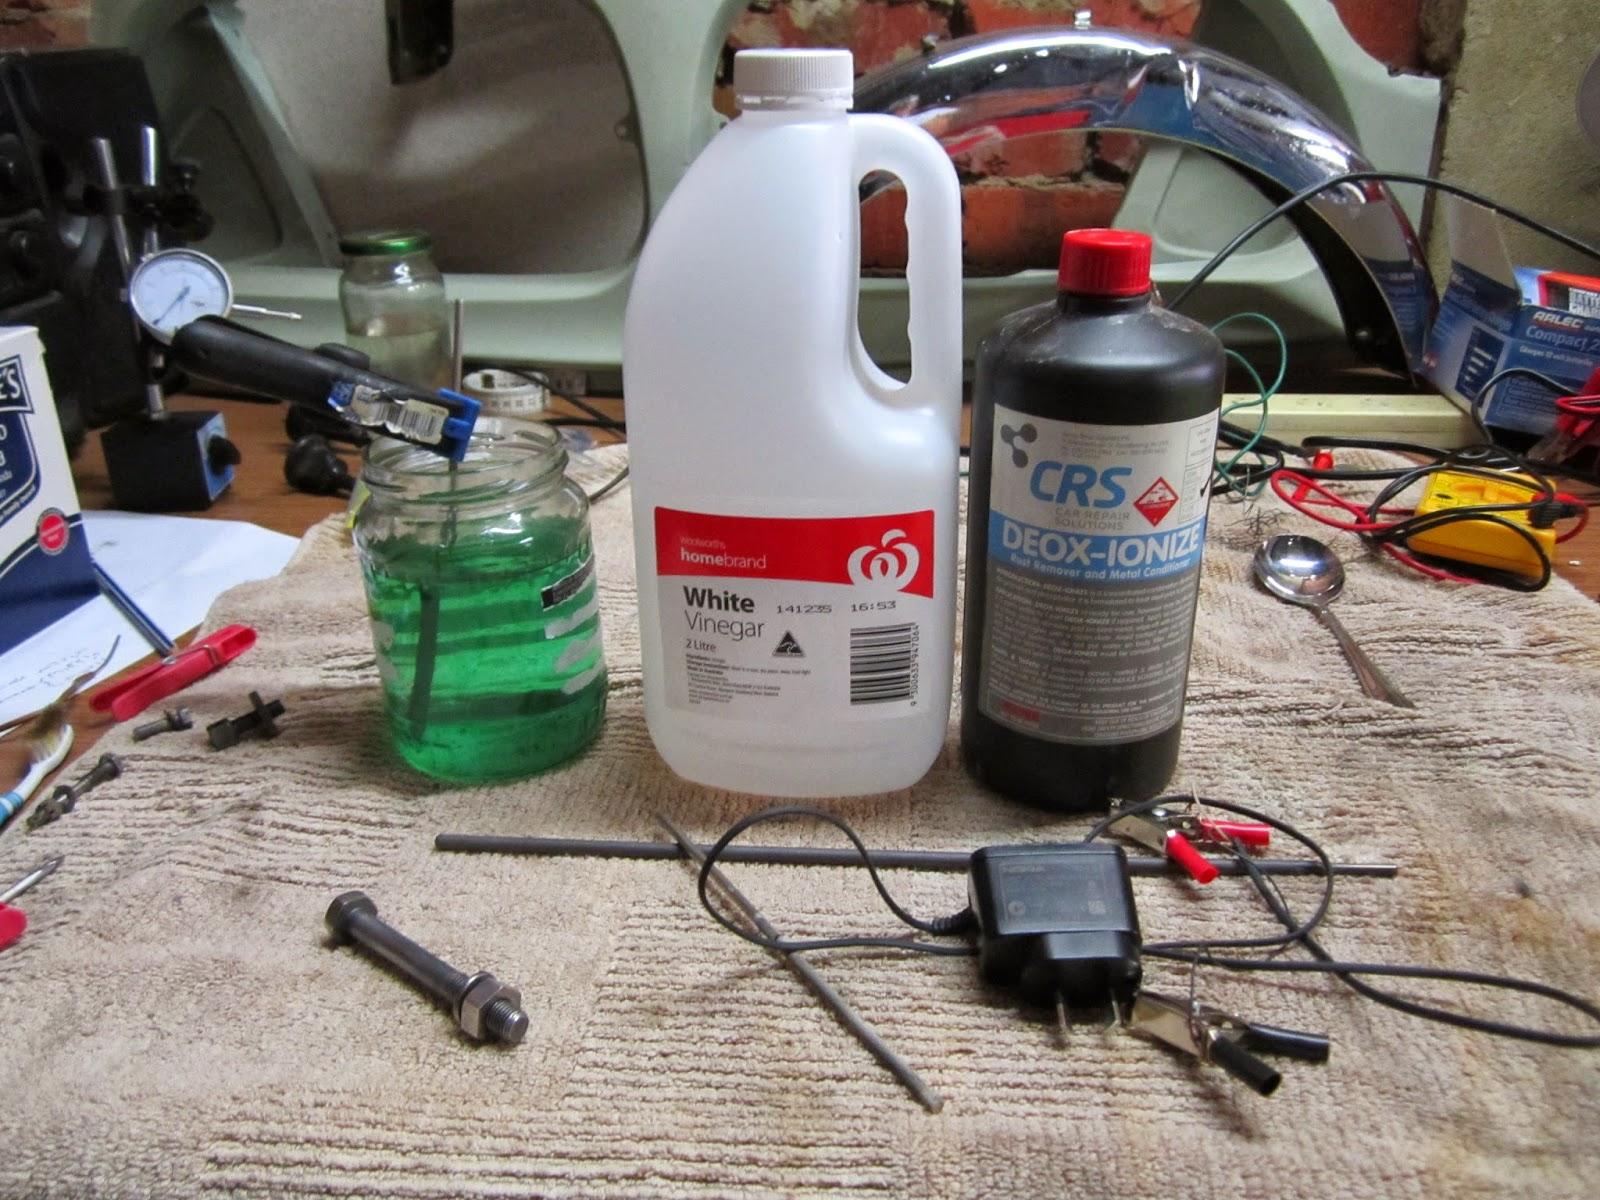 Restoration yamaha ls3 1972 diy nickel plating bolts and nuts diy nickel plating stuff solutioingenieria Choice Image